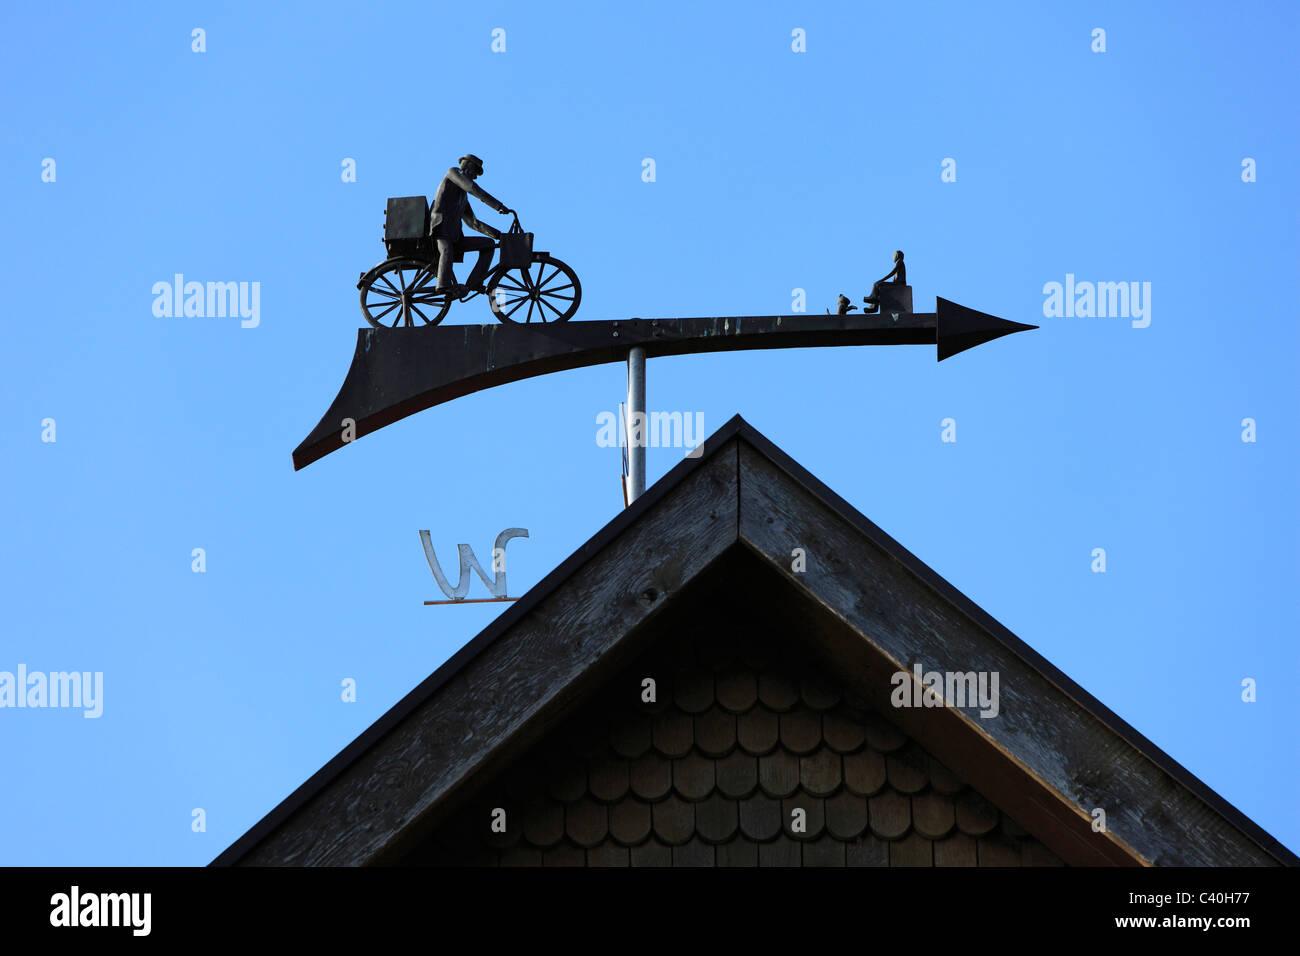 Wind direction, indicator, house roof, Essen, Oldenburg, Oldenburger Munsterland, Lower Saxony, Germany, Europe, - Stock Image